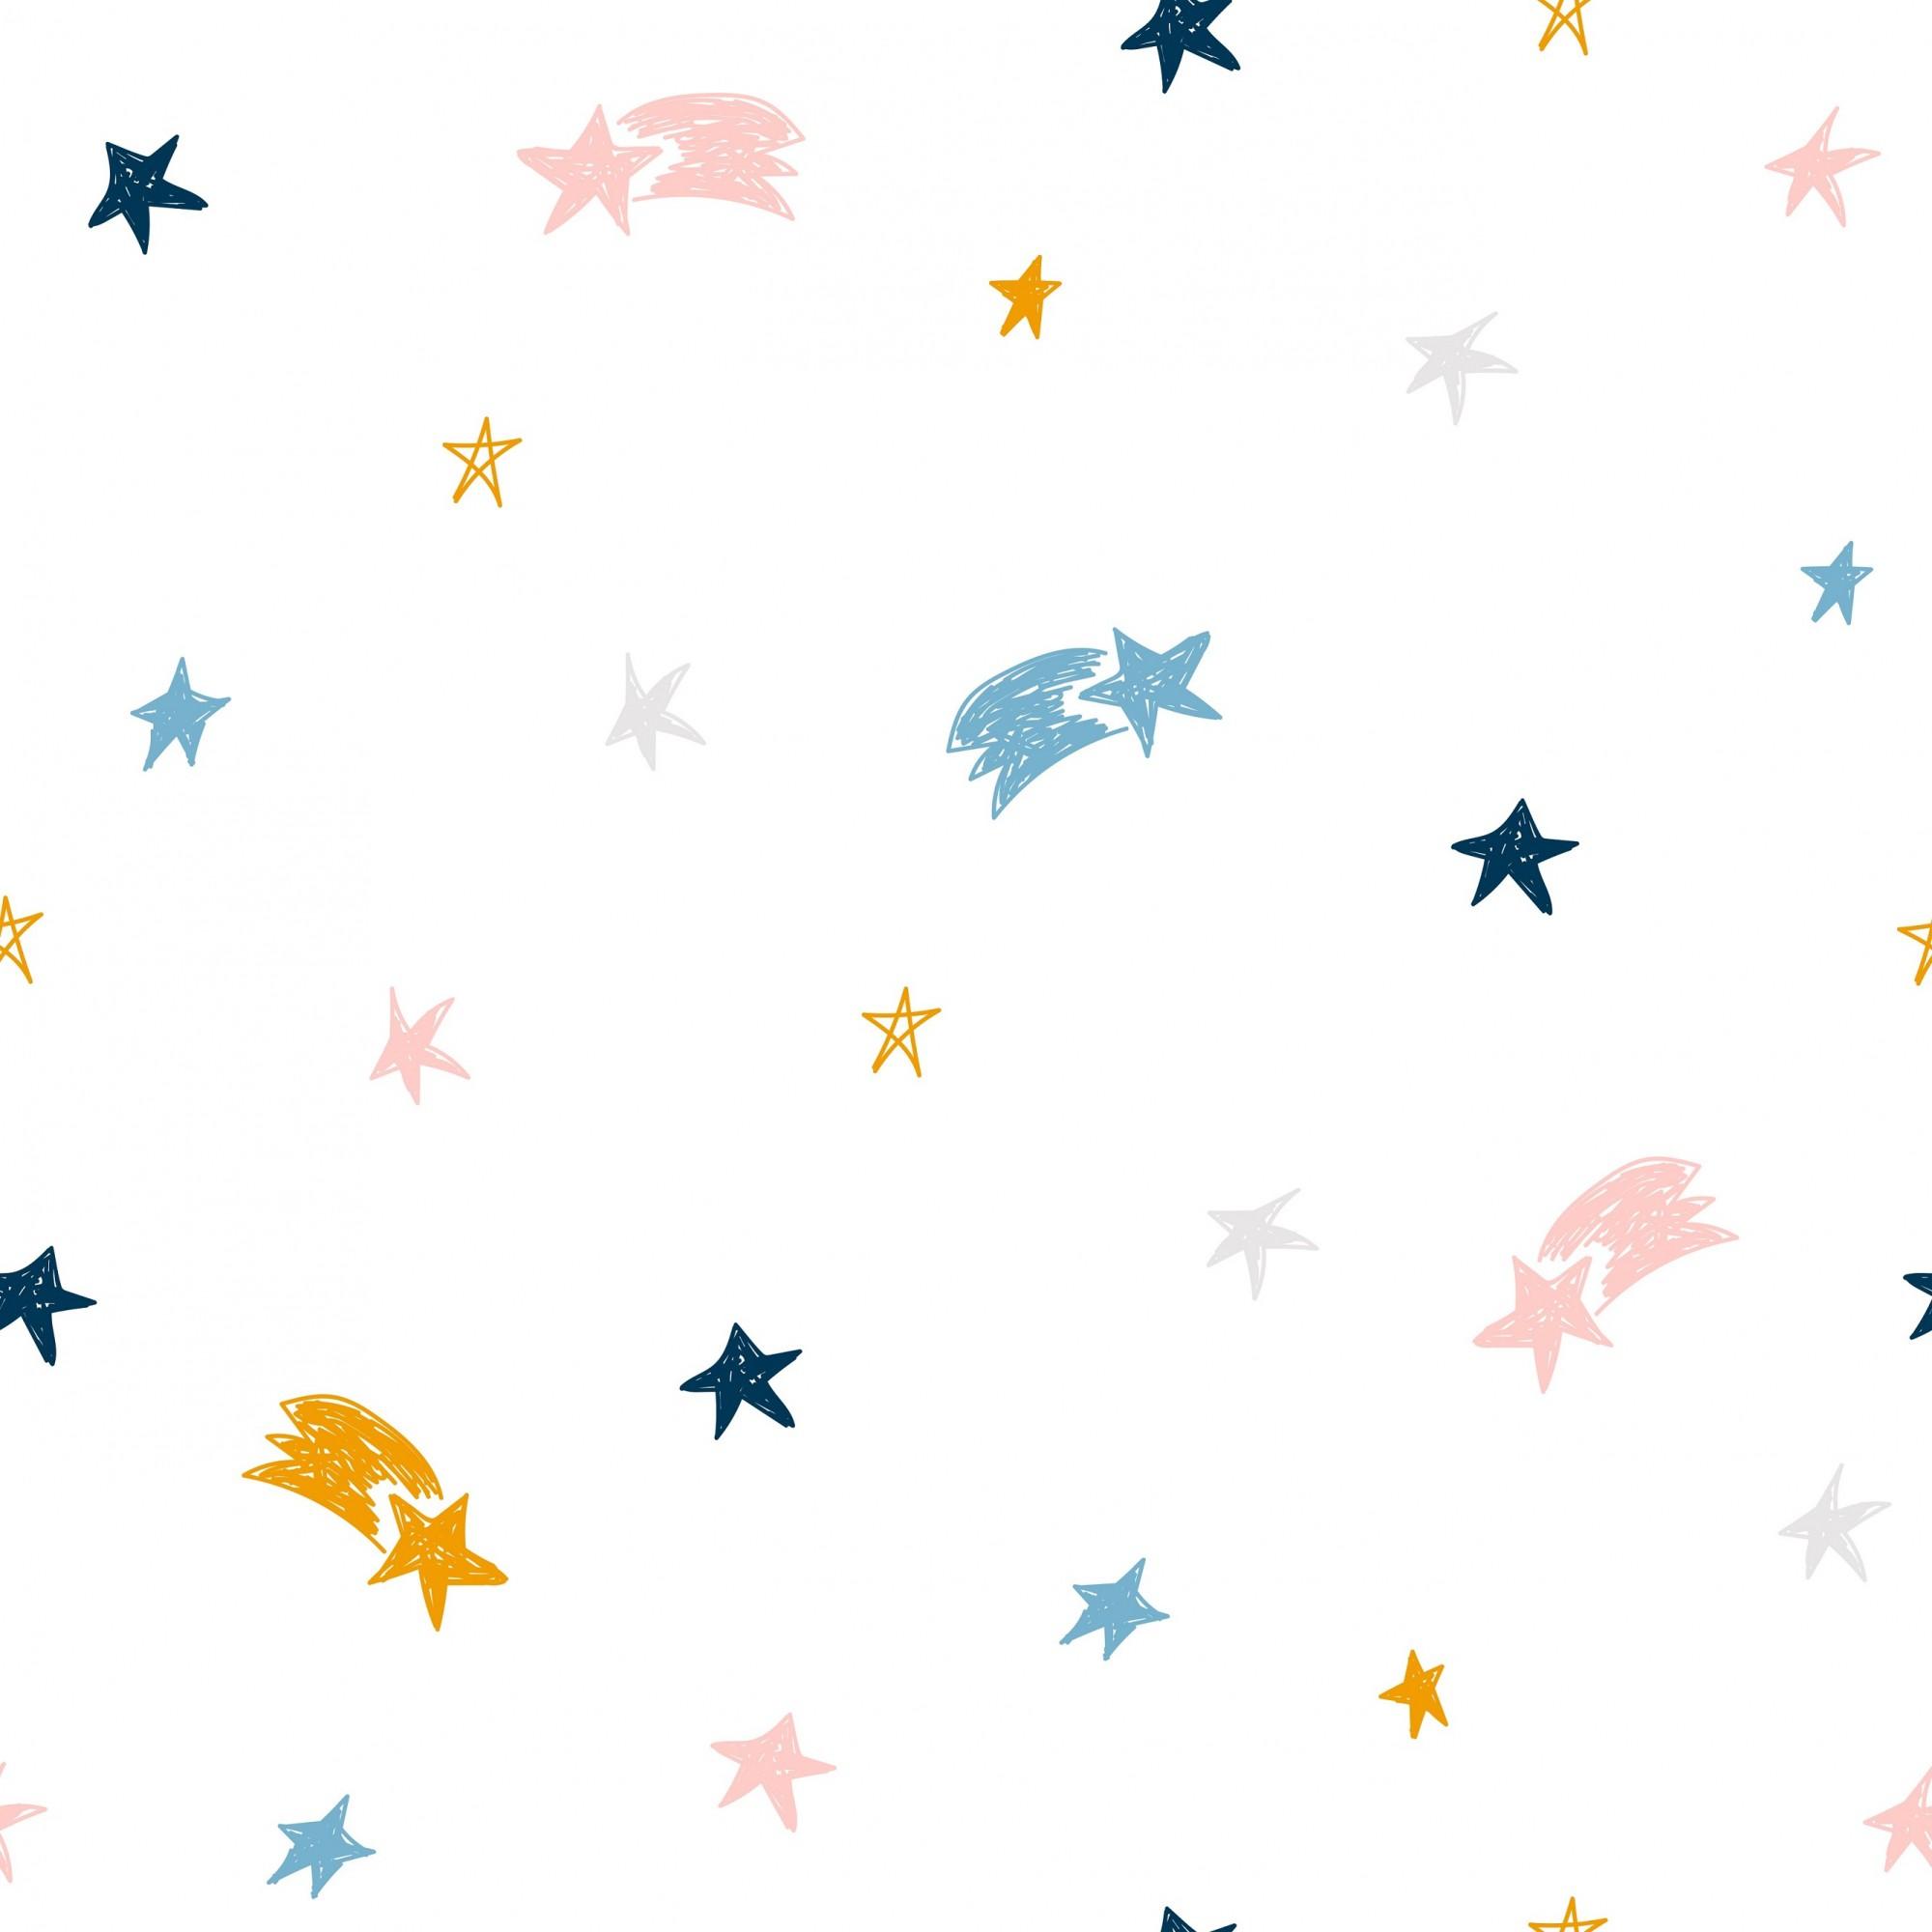 Papel de Parede ADESIVO - estrela cadente